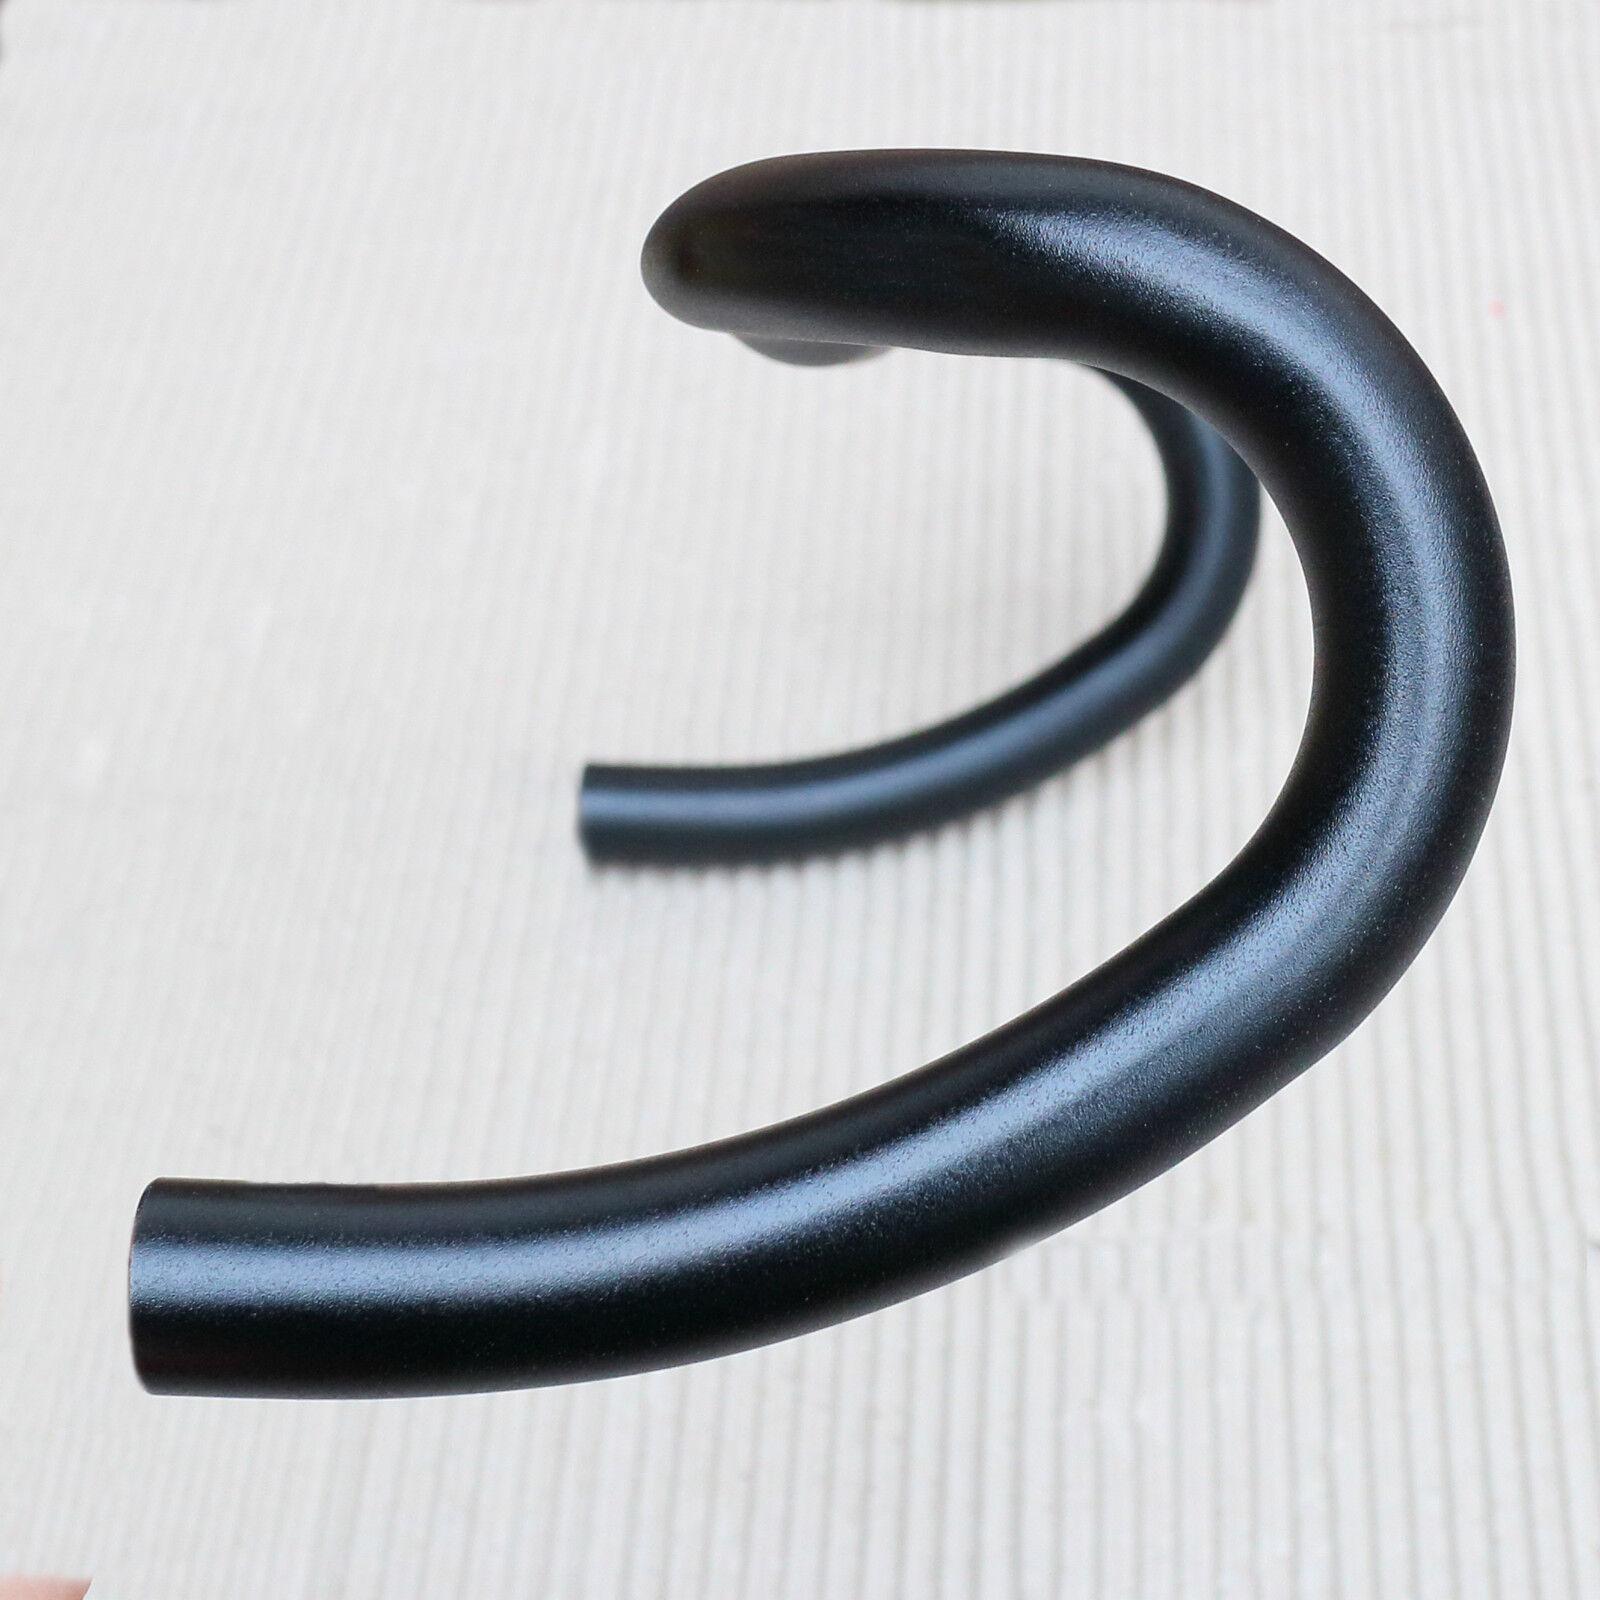 FSA Rennradlenker - Gossamer Compact Road - 31,8 mm - B = 440 mm (c-c) - schwarz